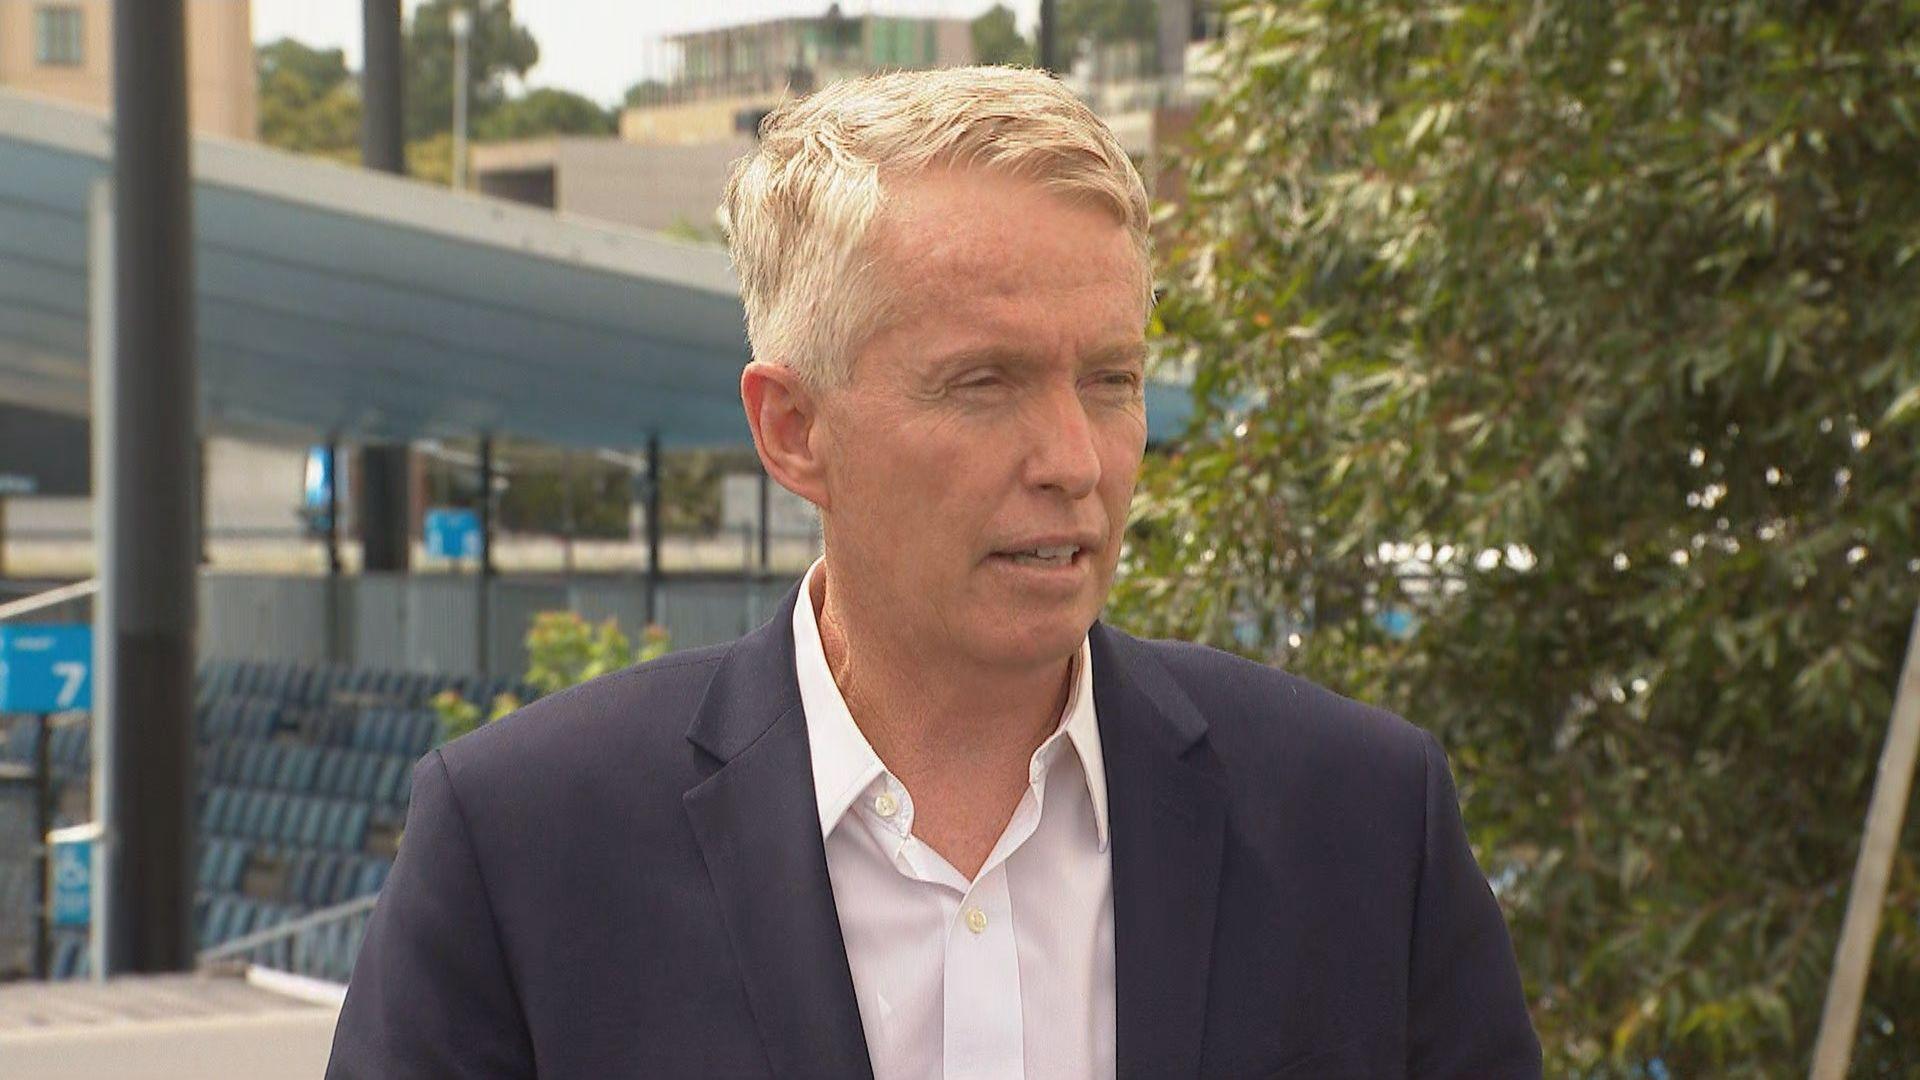 Australian Open boss Craig Tiley says it's 'full steam ahead' despite COVID-19 scare